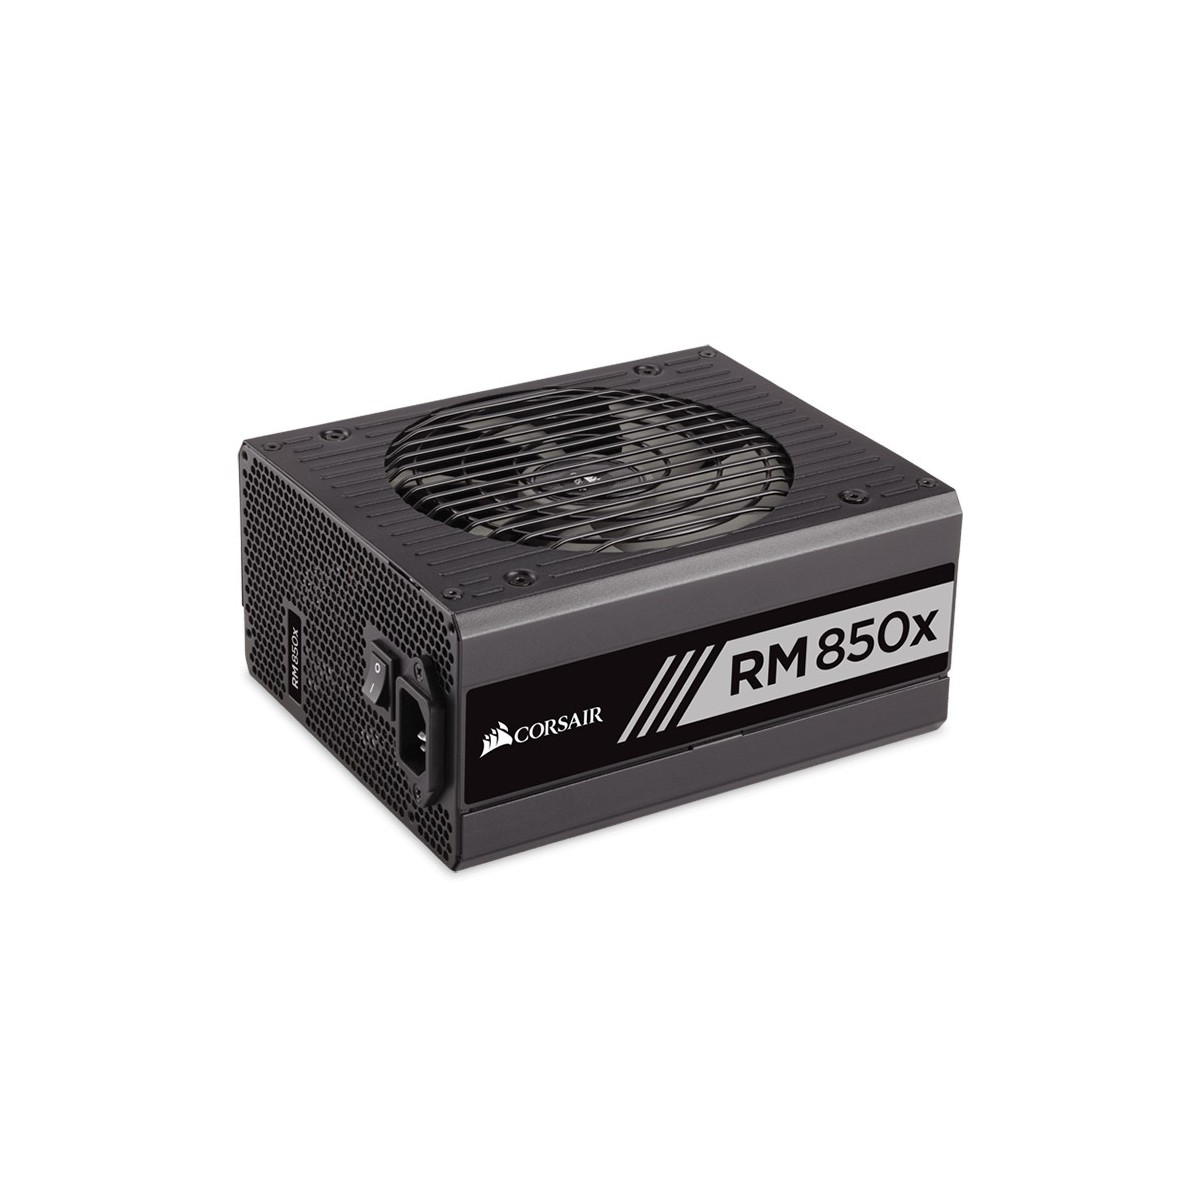 Corsair RMx Series™ RM850x 80 PLUS® Gold Certified Fully Modular